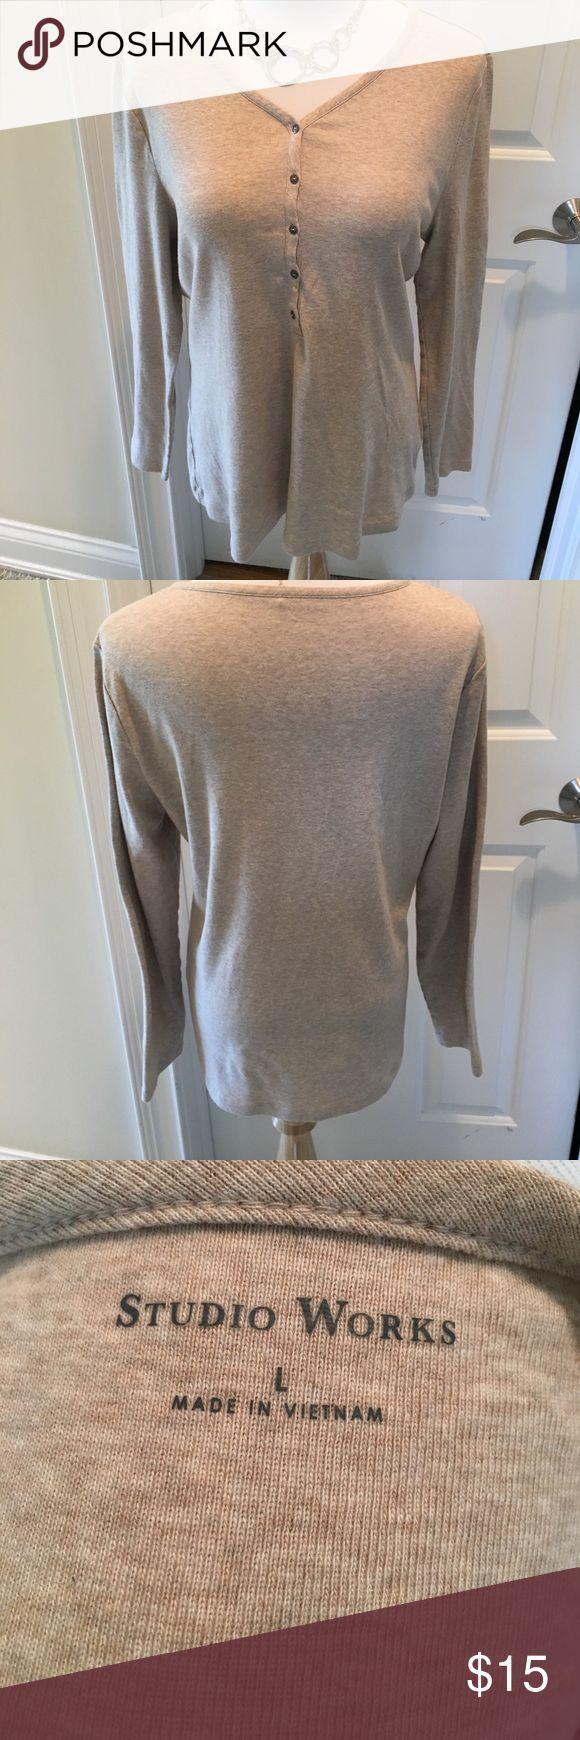 Studio Works Long Sleeved V Neck Henley Shirt 👚 Long sleeved v neck cotton Henley shirt. Button front.  Metal buttons.  Heather khaki color.  Full cut. EUC. Nonsmoking house. Studio Works Tops